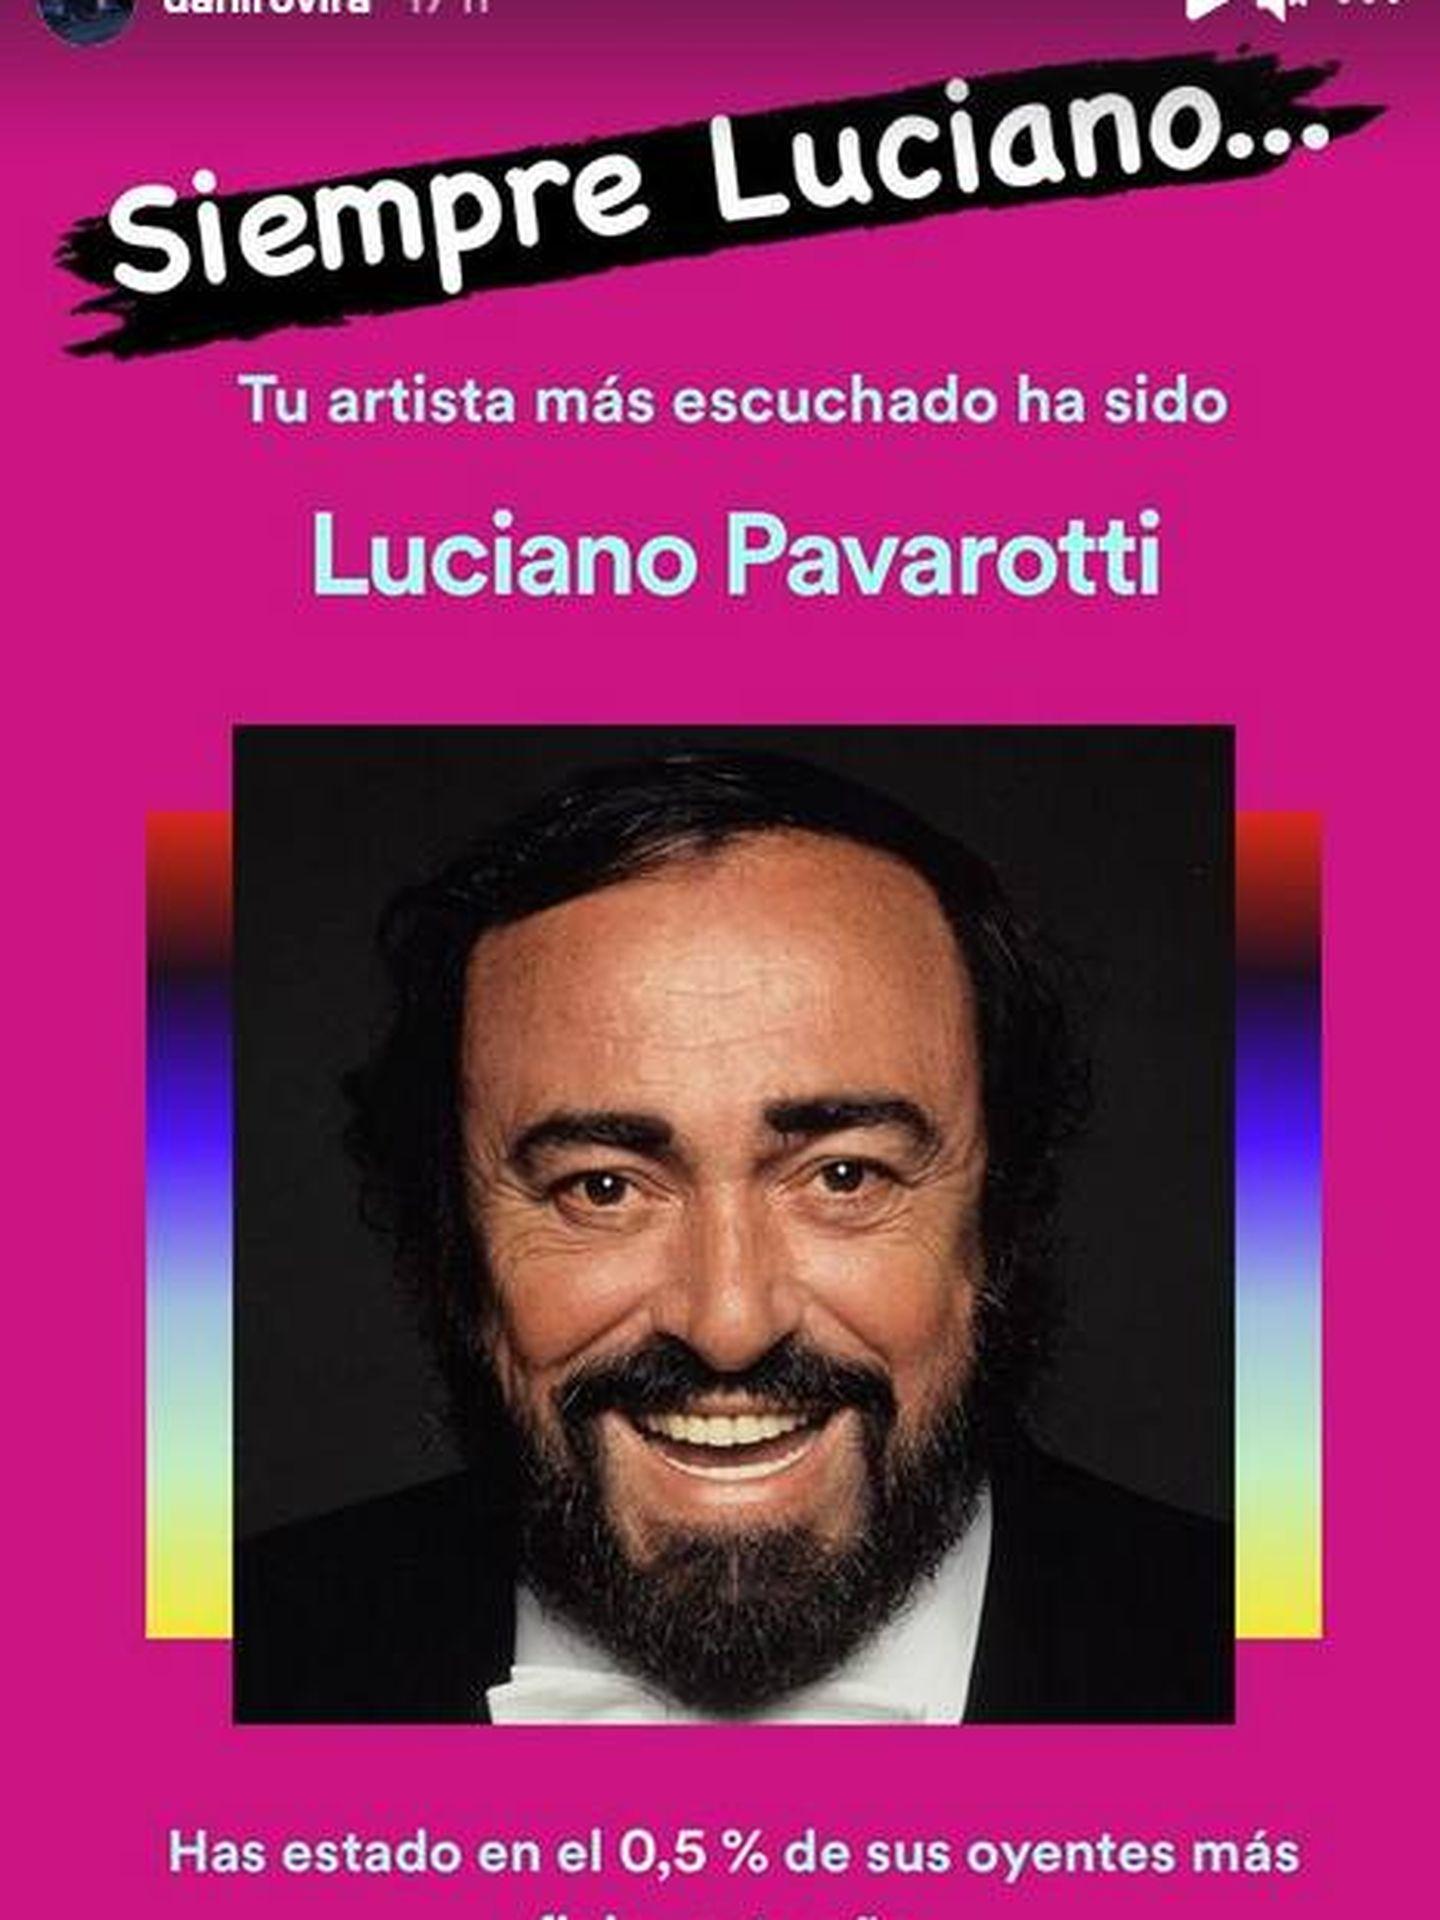 Siempre Luciano. (IG @danirovira)